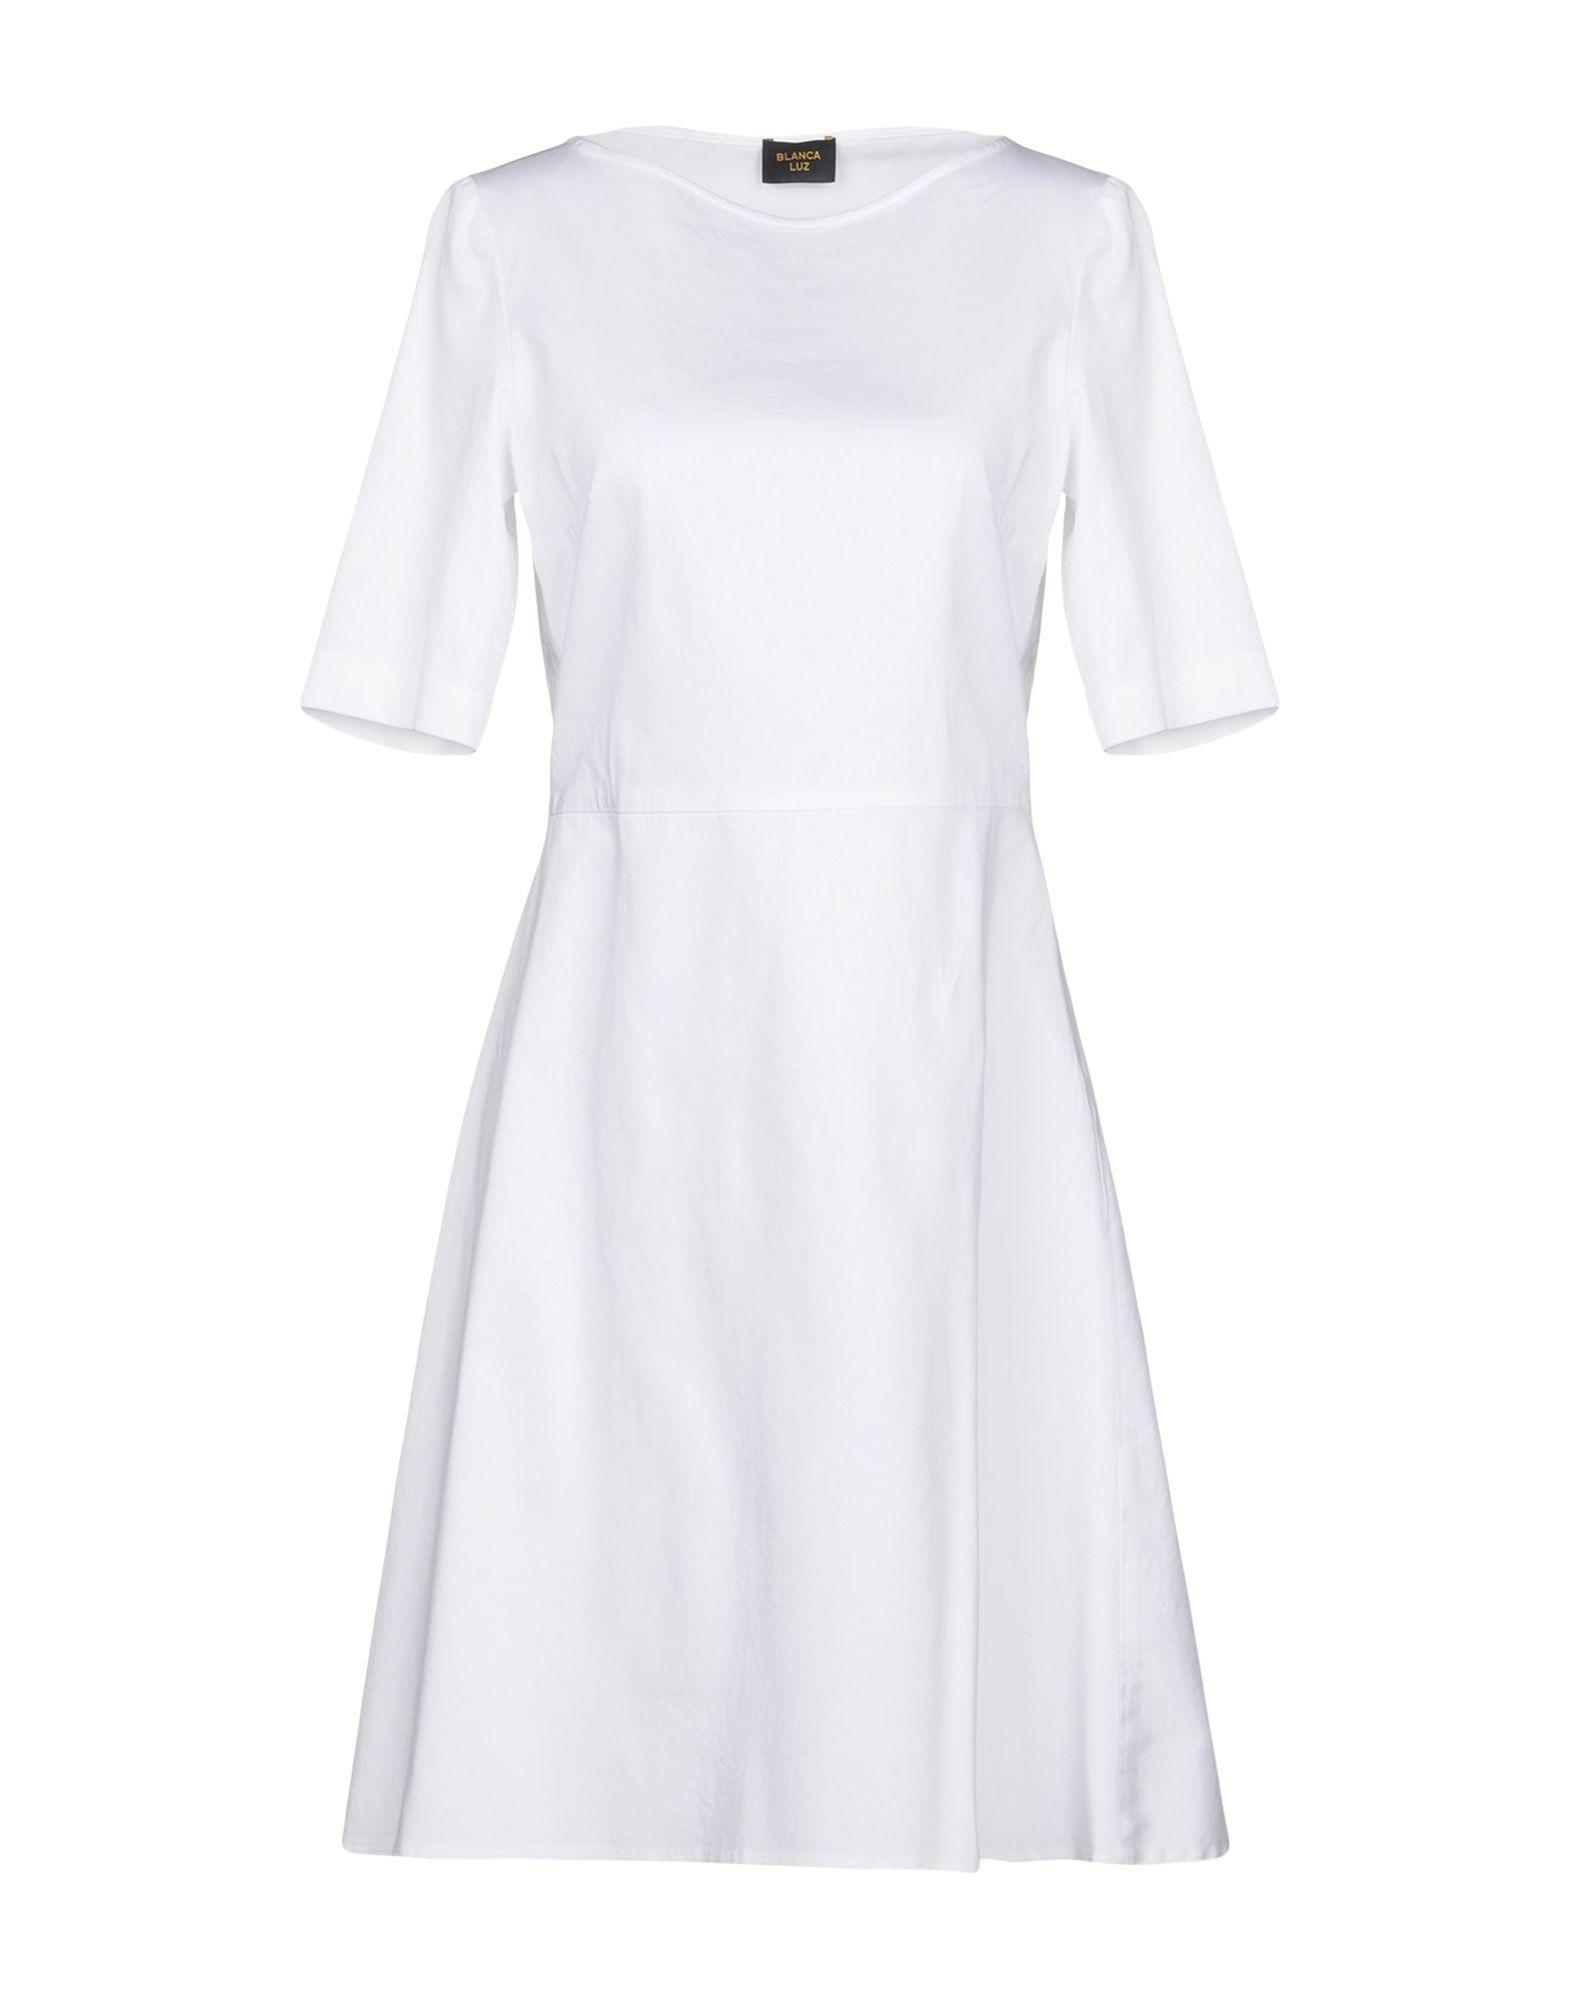 BLANCA LUZ Короткое платье luz casal cap roig